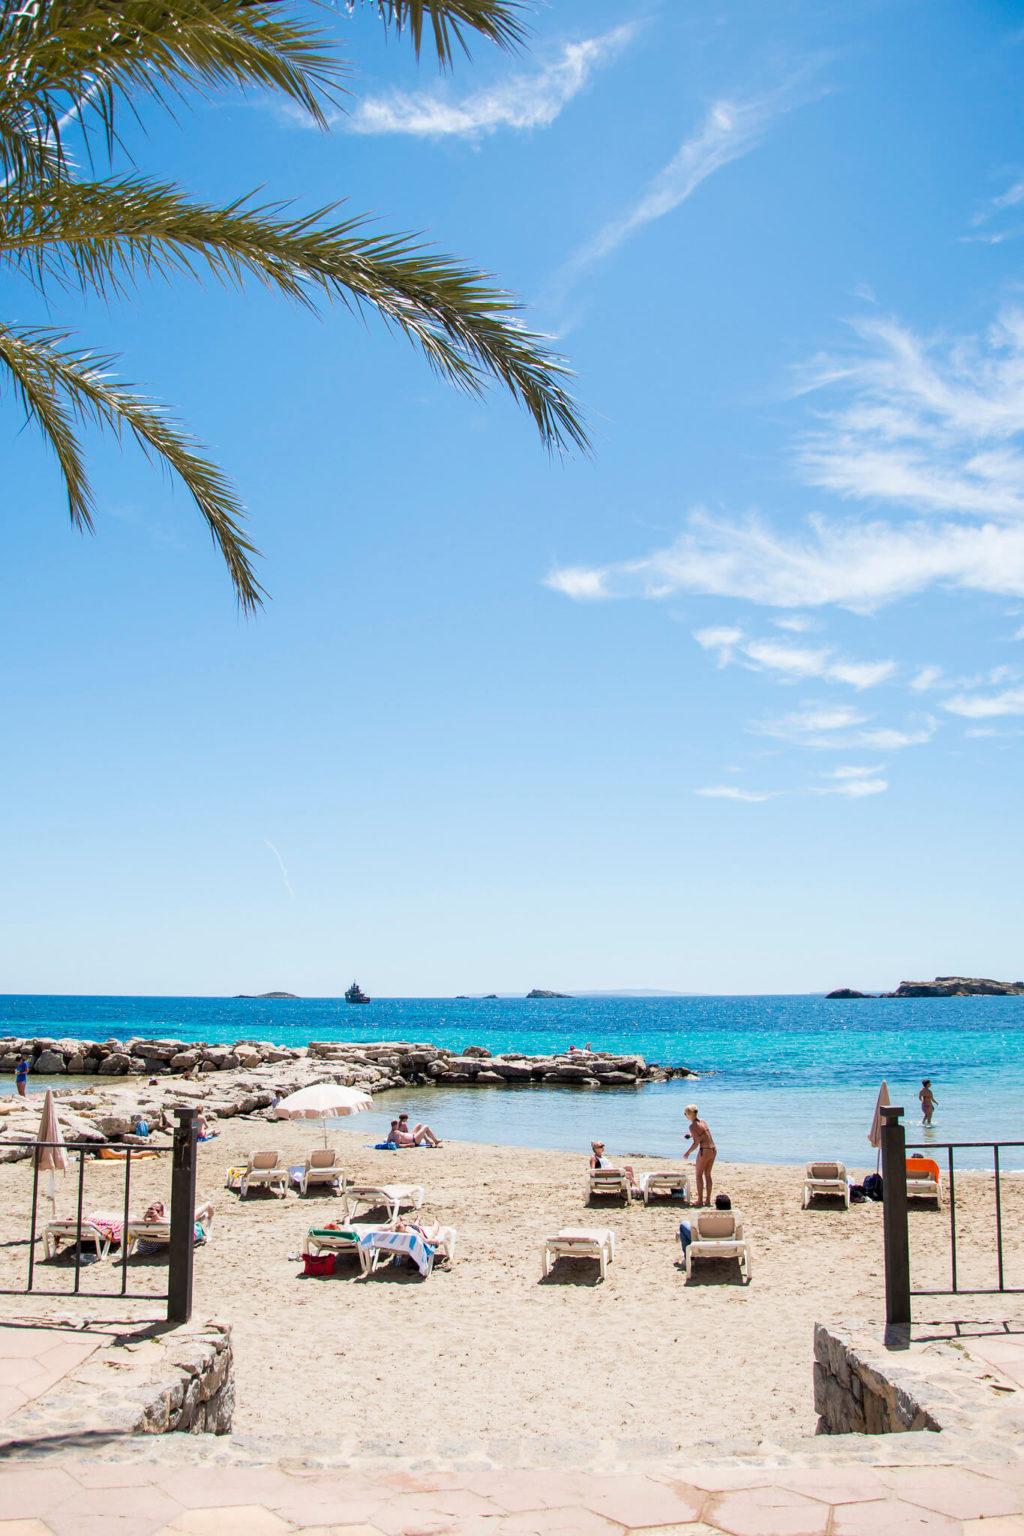 https://www.white-ibiza.com/wp-content/uploads/2020/03/ibiza-beaches-figueretas-03-1024x1536.jpg